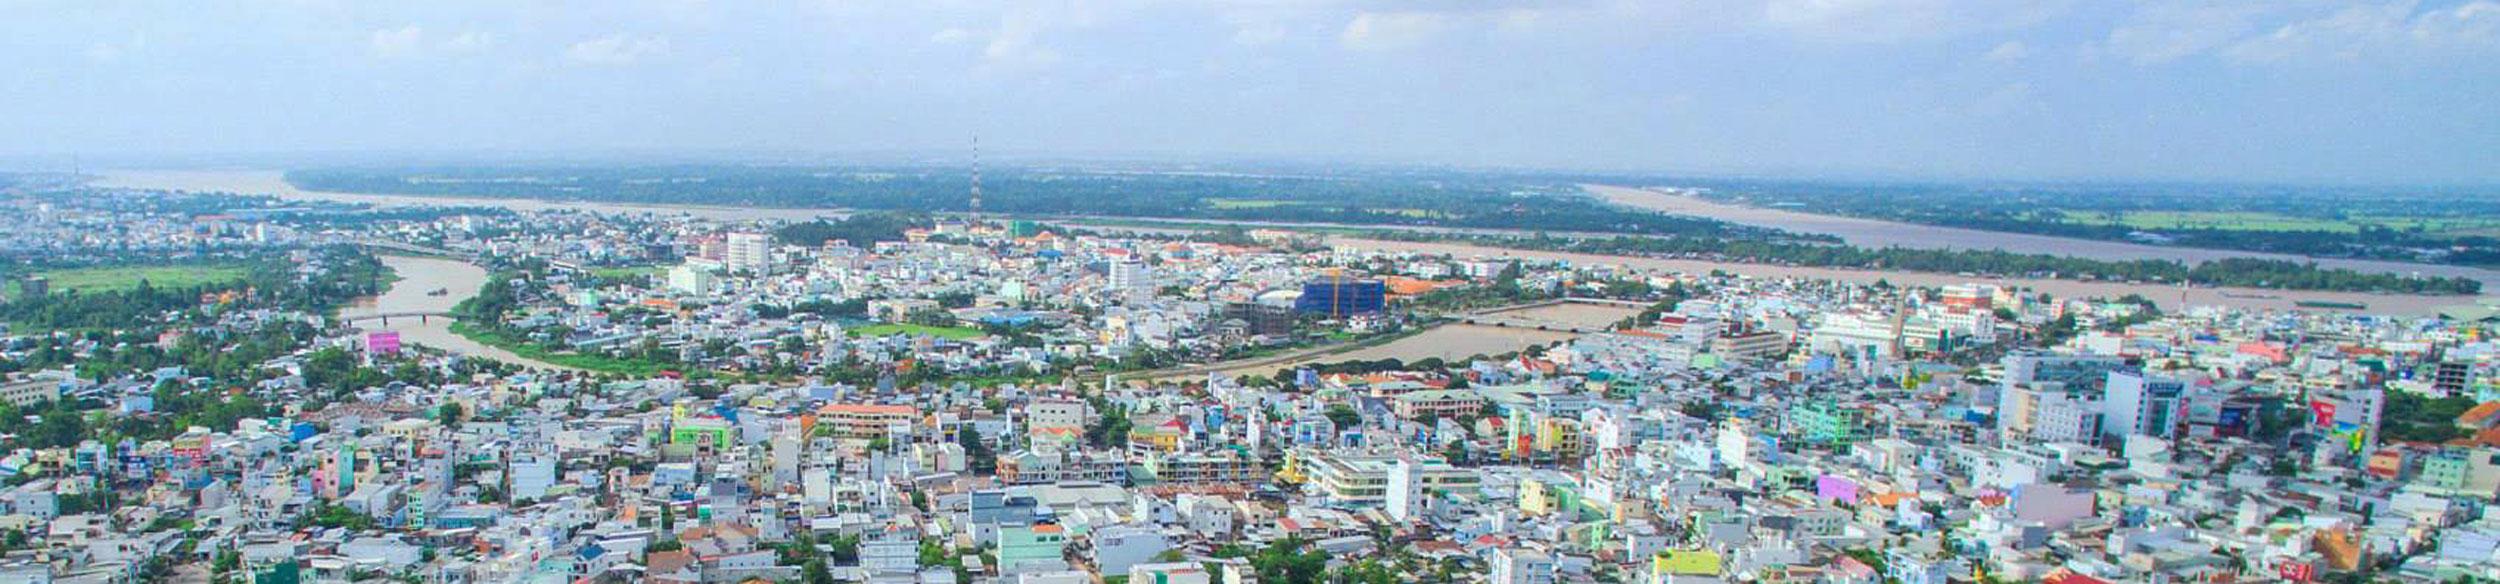 Panorama de la ville de Long Xuyen